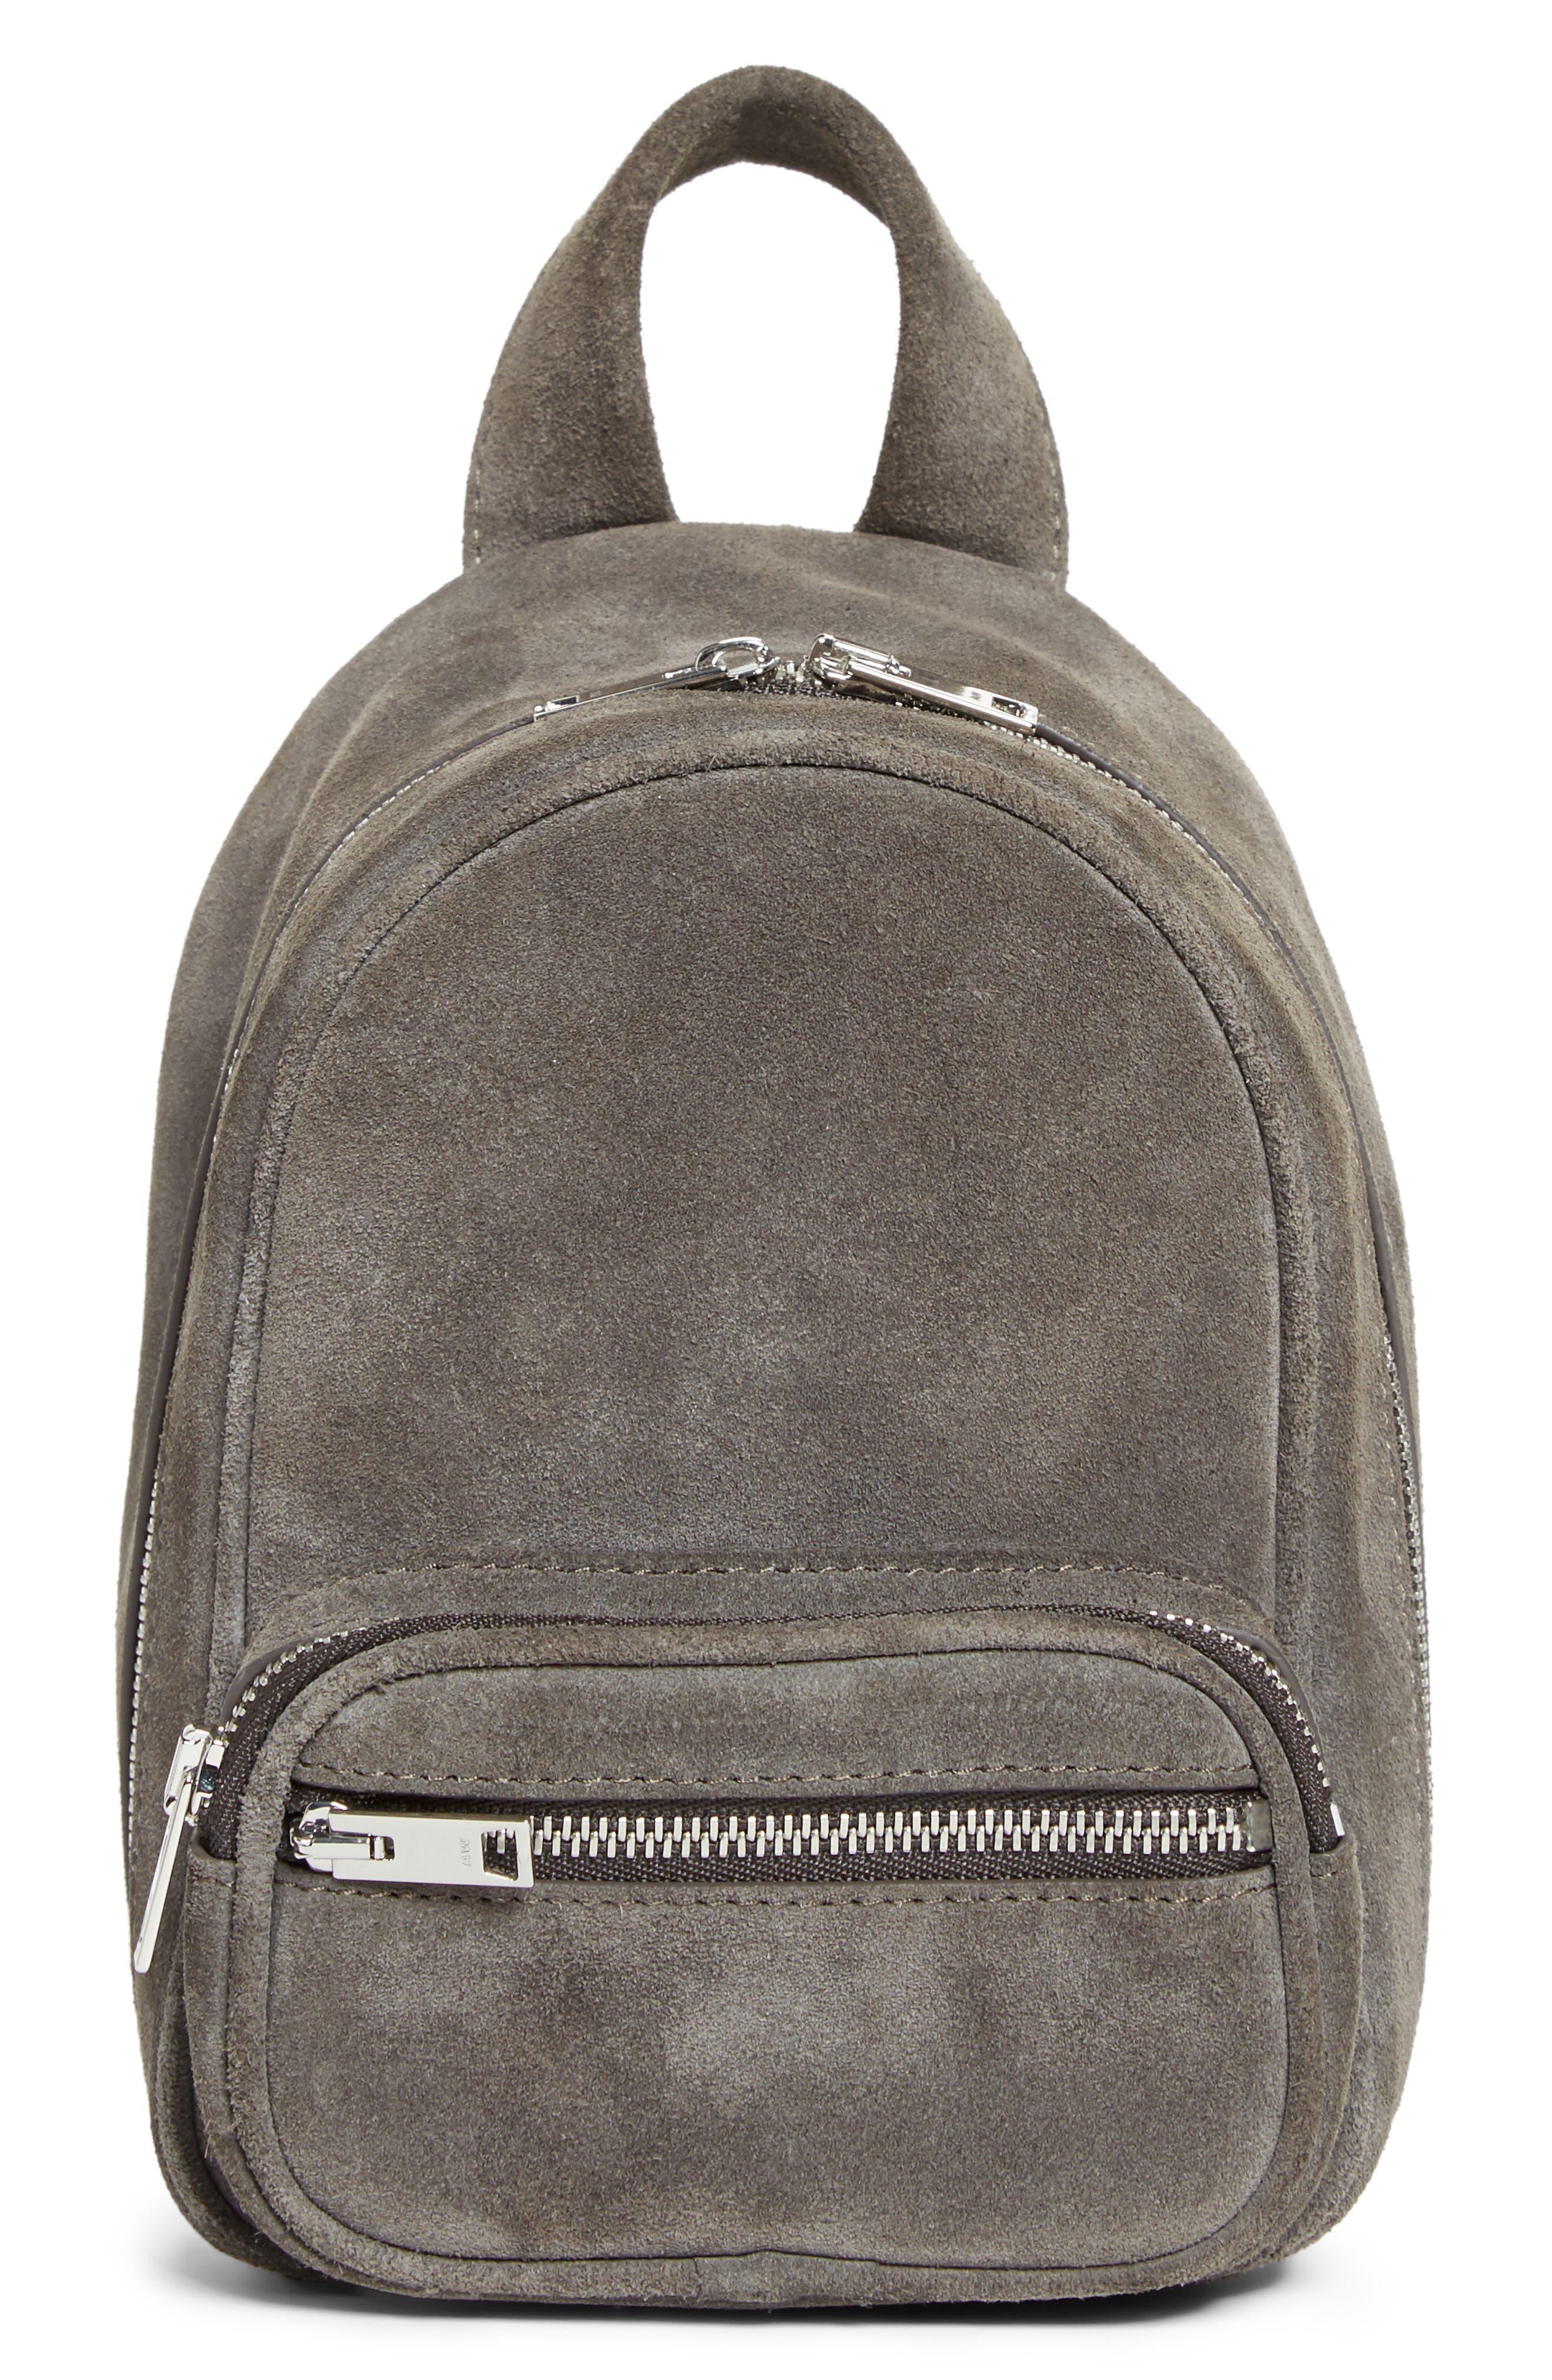 Main Image - Alexander Wang Mini Attica Leather Crossbody Backpack